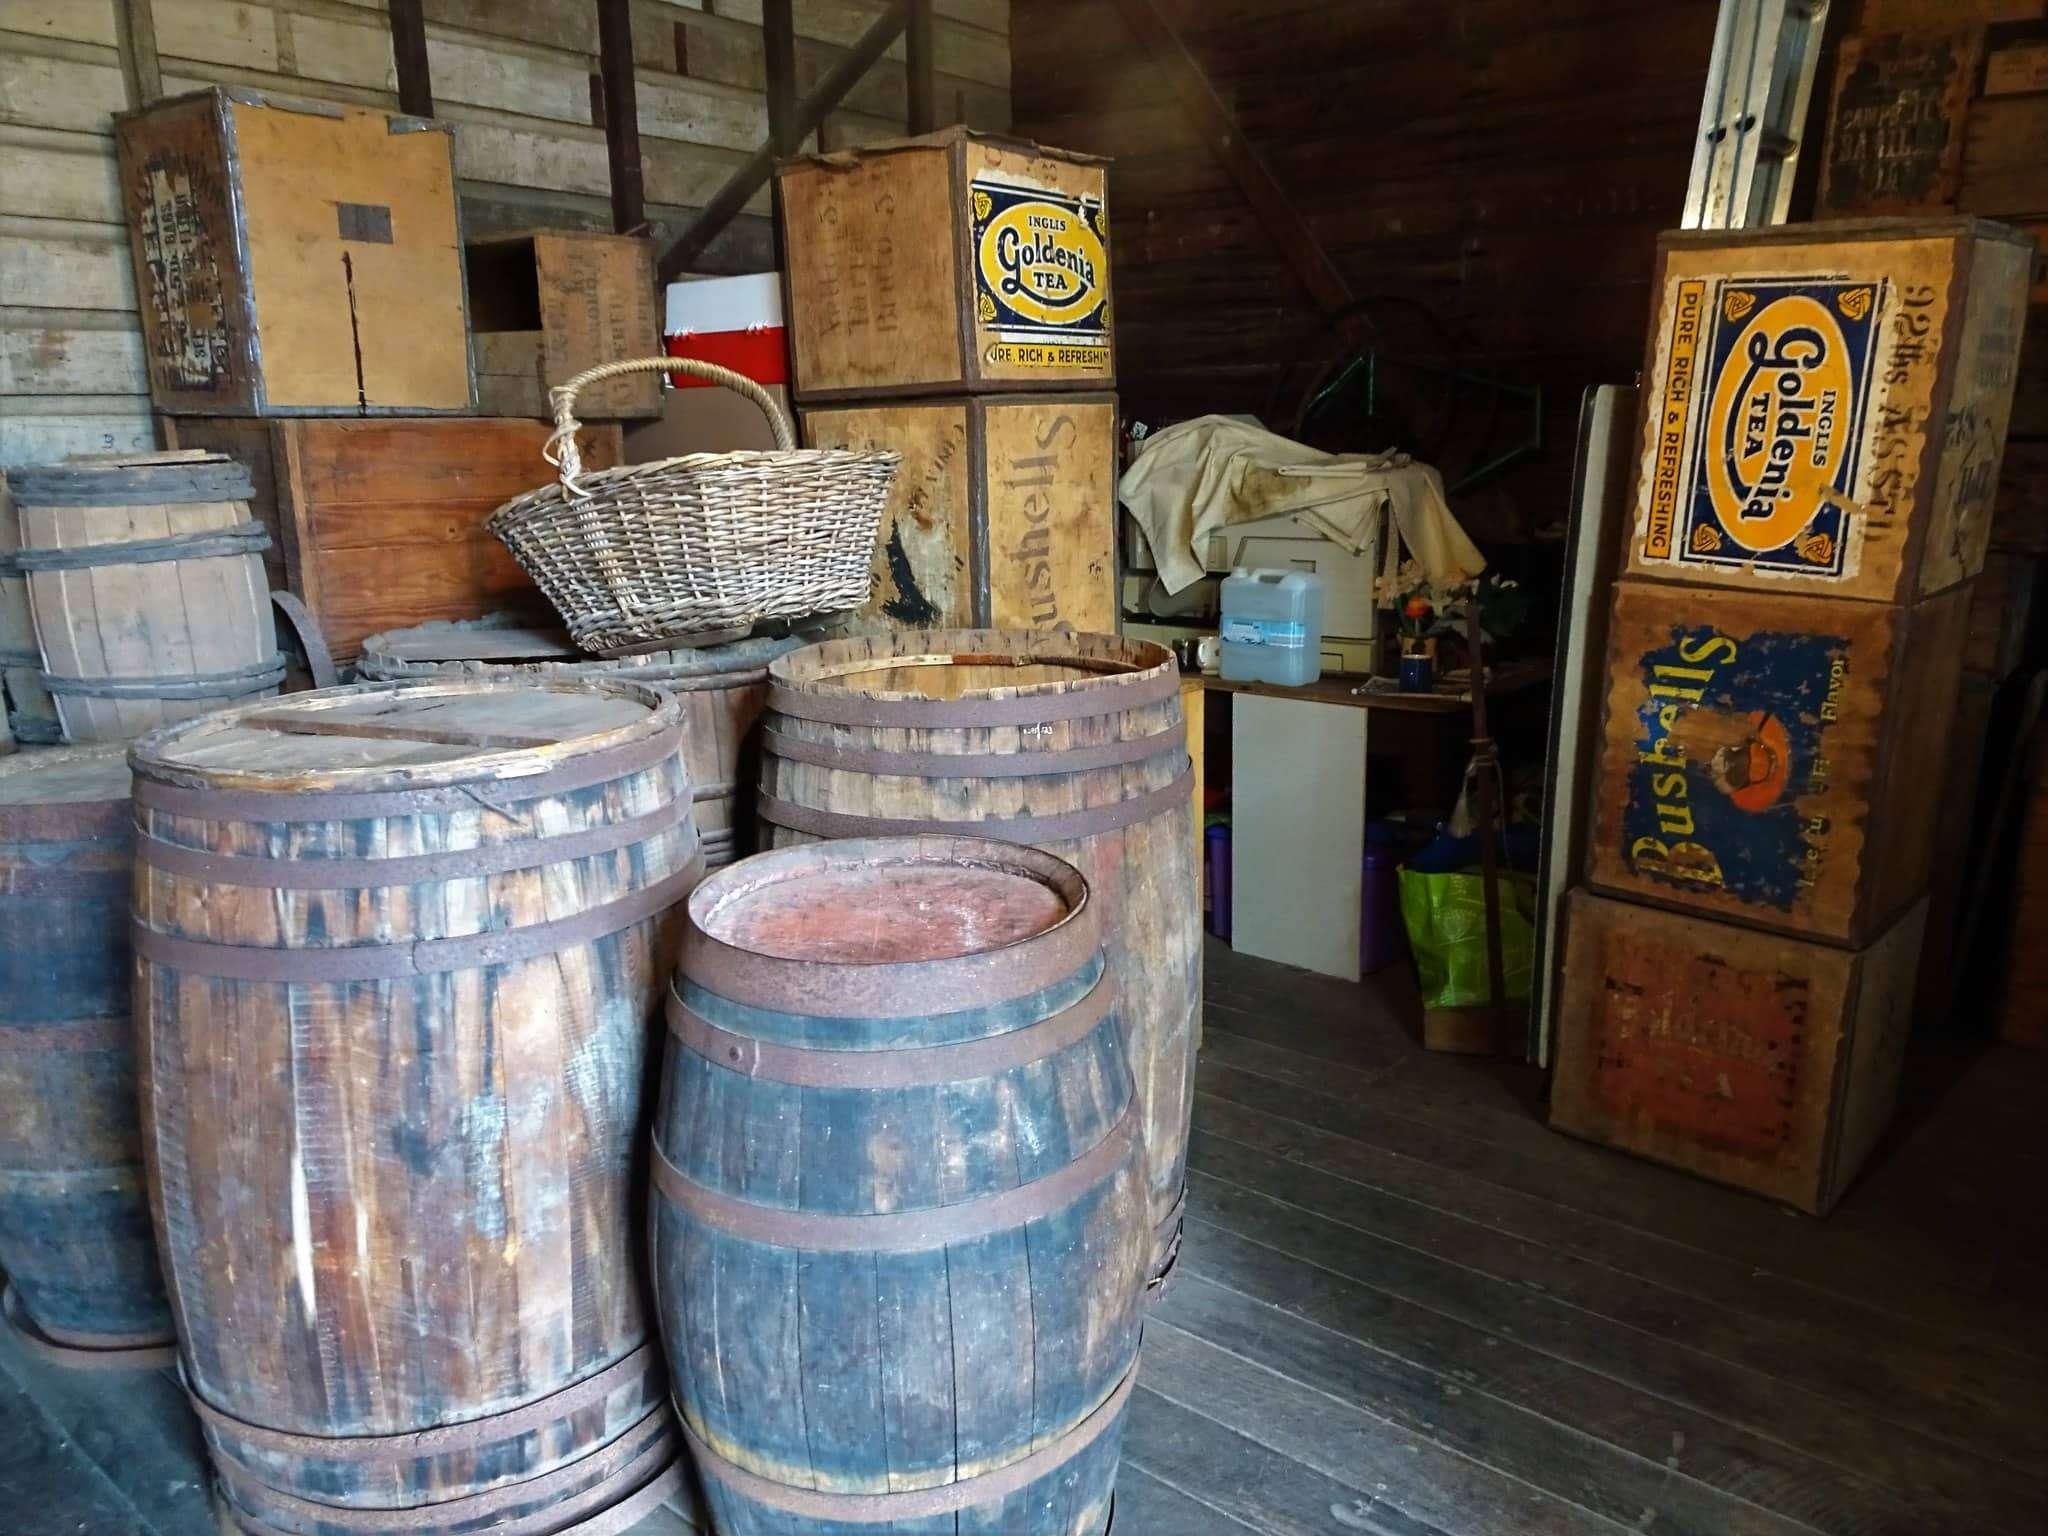 T Ching Classics: Tea Storage - Photo of barrels and crates of tea.